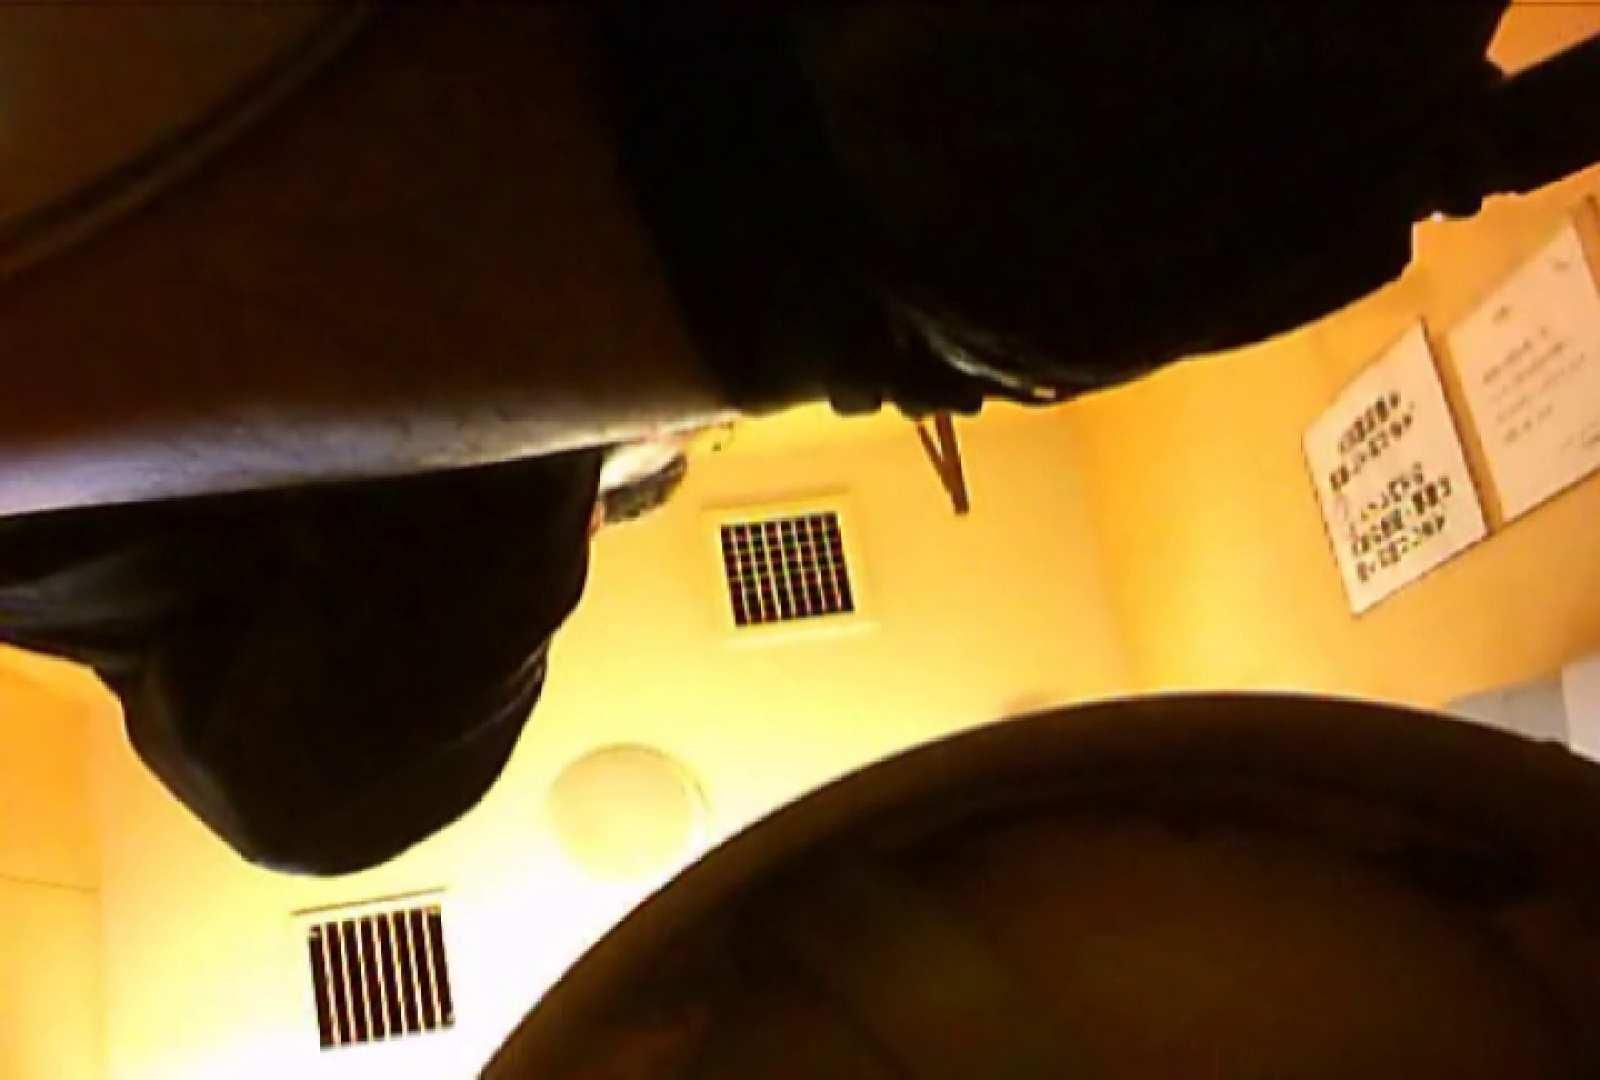 SEASON 2ND!掴み取りさんの洗面所覗き!in新幹線!VOL.02 覗きお宝 ゲイSEX画像 80連発 6